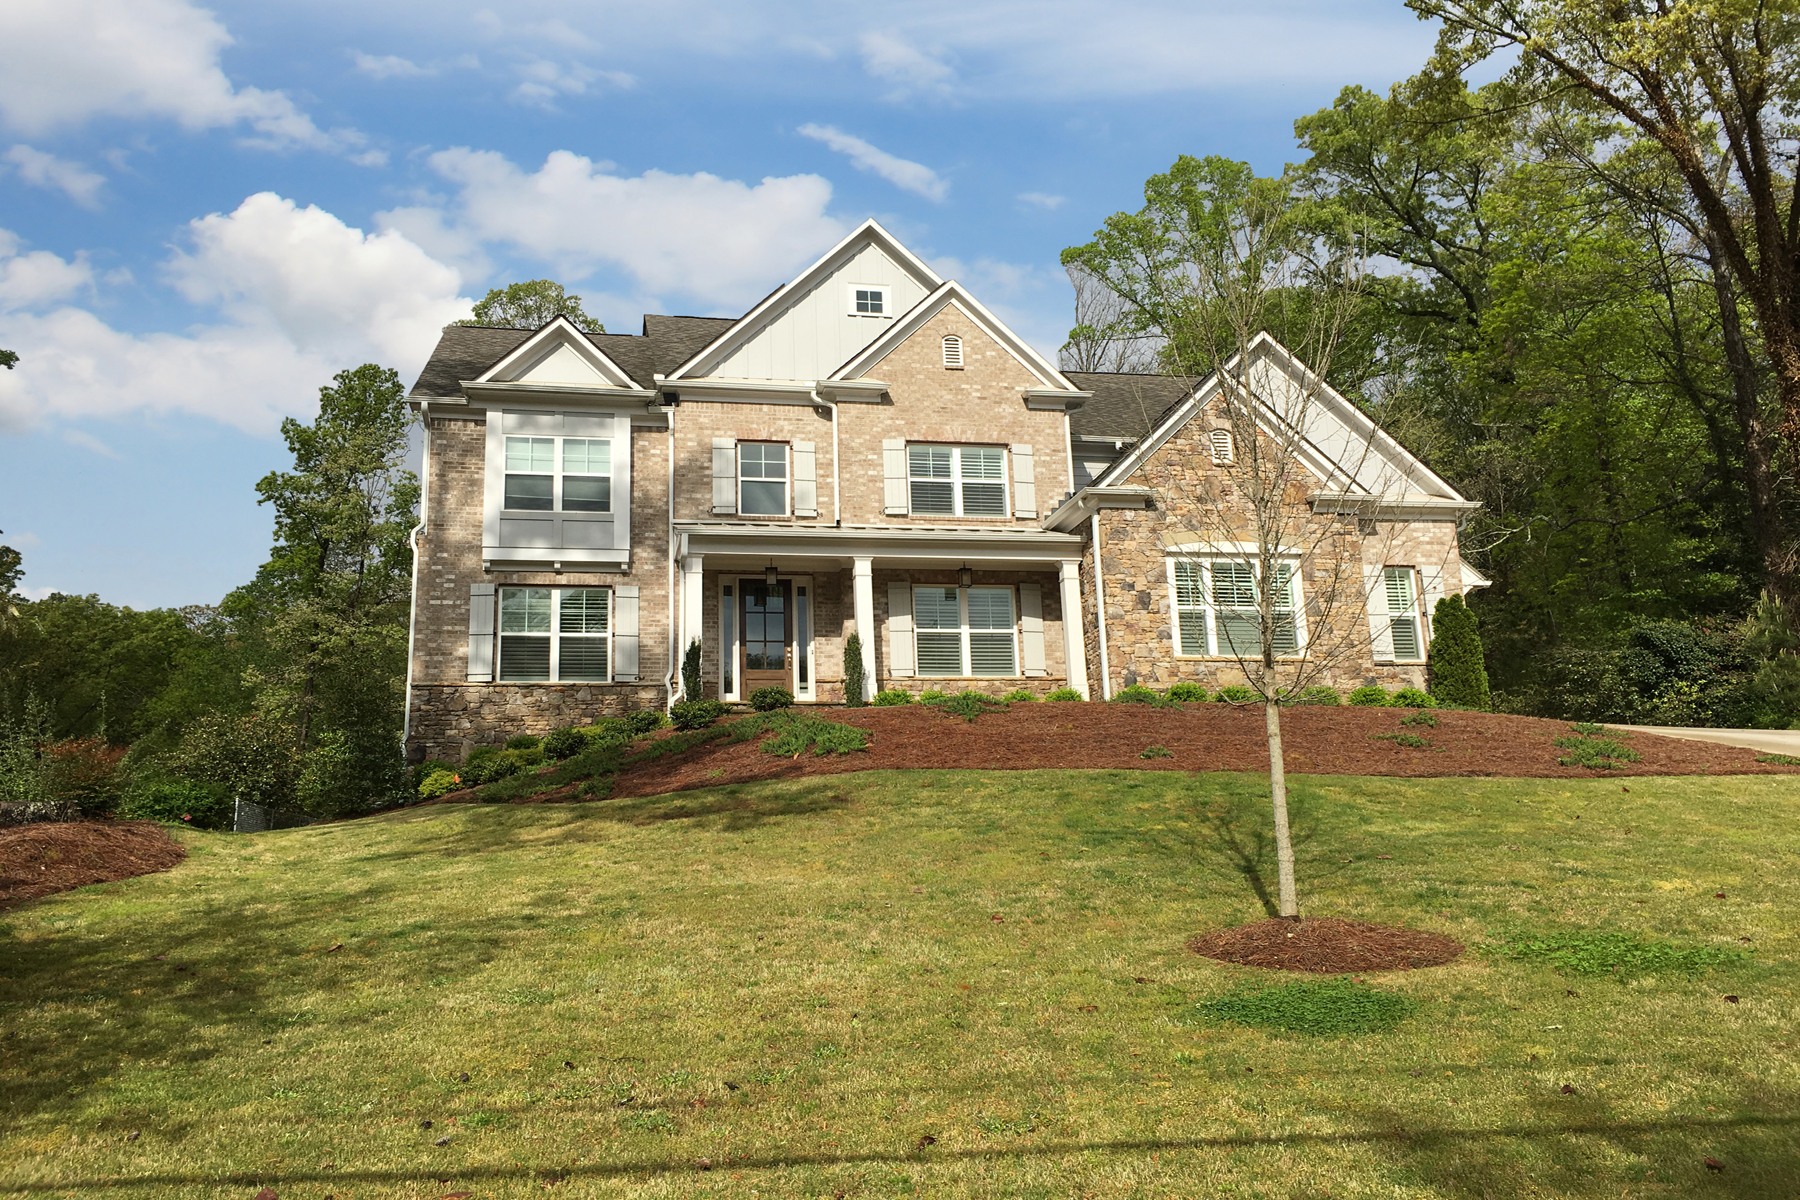 獨棟家庭住宅 為 出售 在 Gorgeous Traditional Style Home 6440 Bridgewood Valley Road Sandy Springs, 喬治亞州, 30328 美國